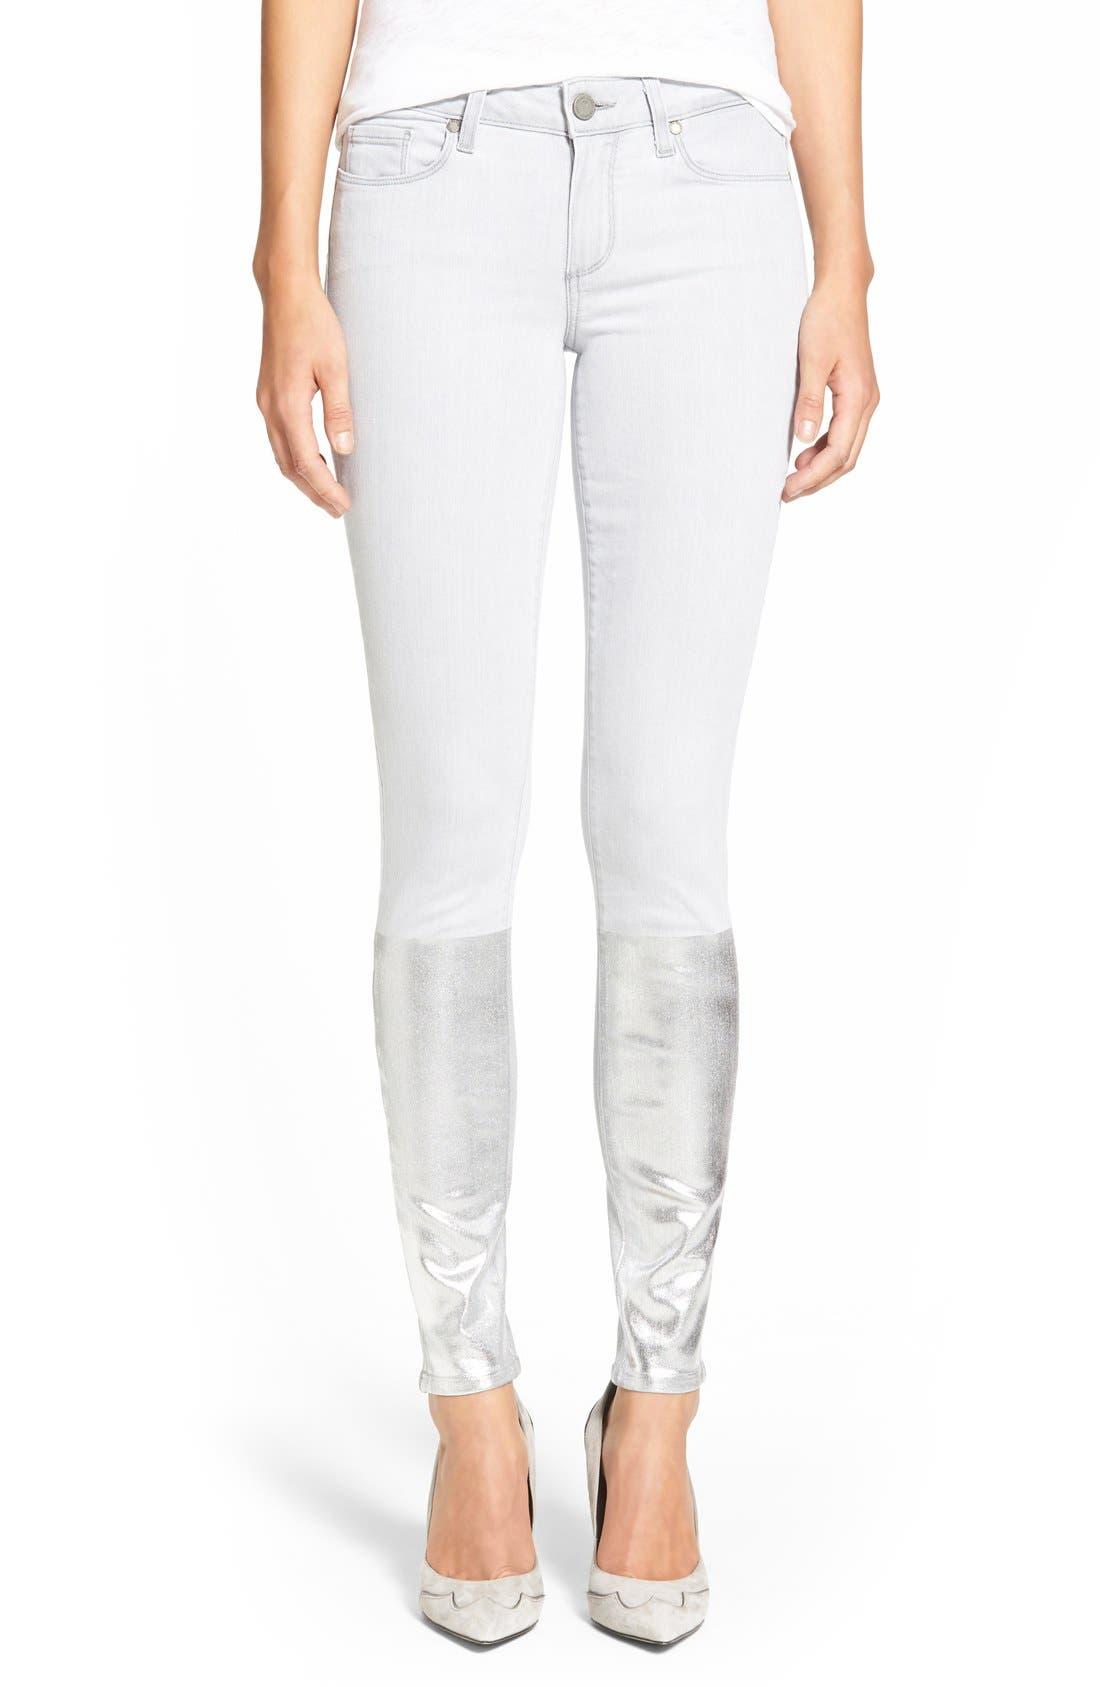 Alternate Image 1 Selected - PaigeDenim 'Verdugo' Ankle Ultra Skinny Jeans (Light Grey/Silver Solstice)